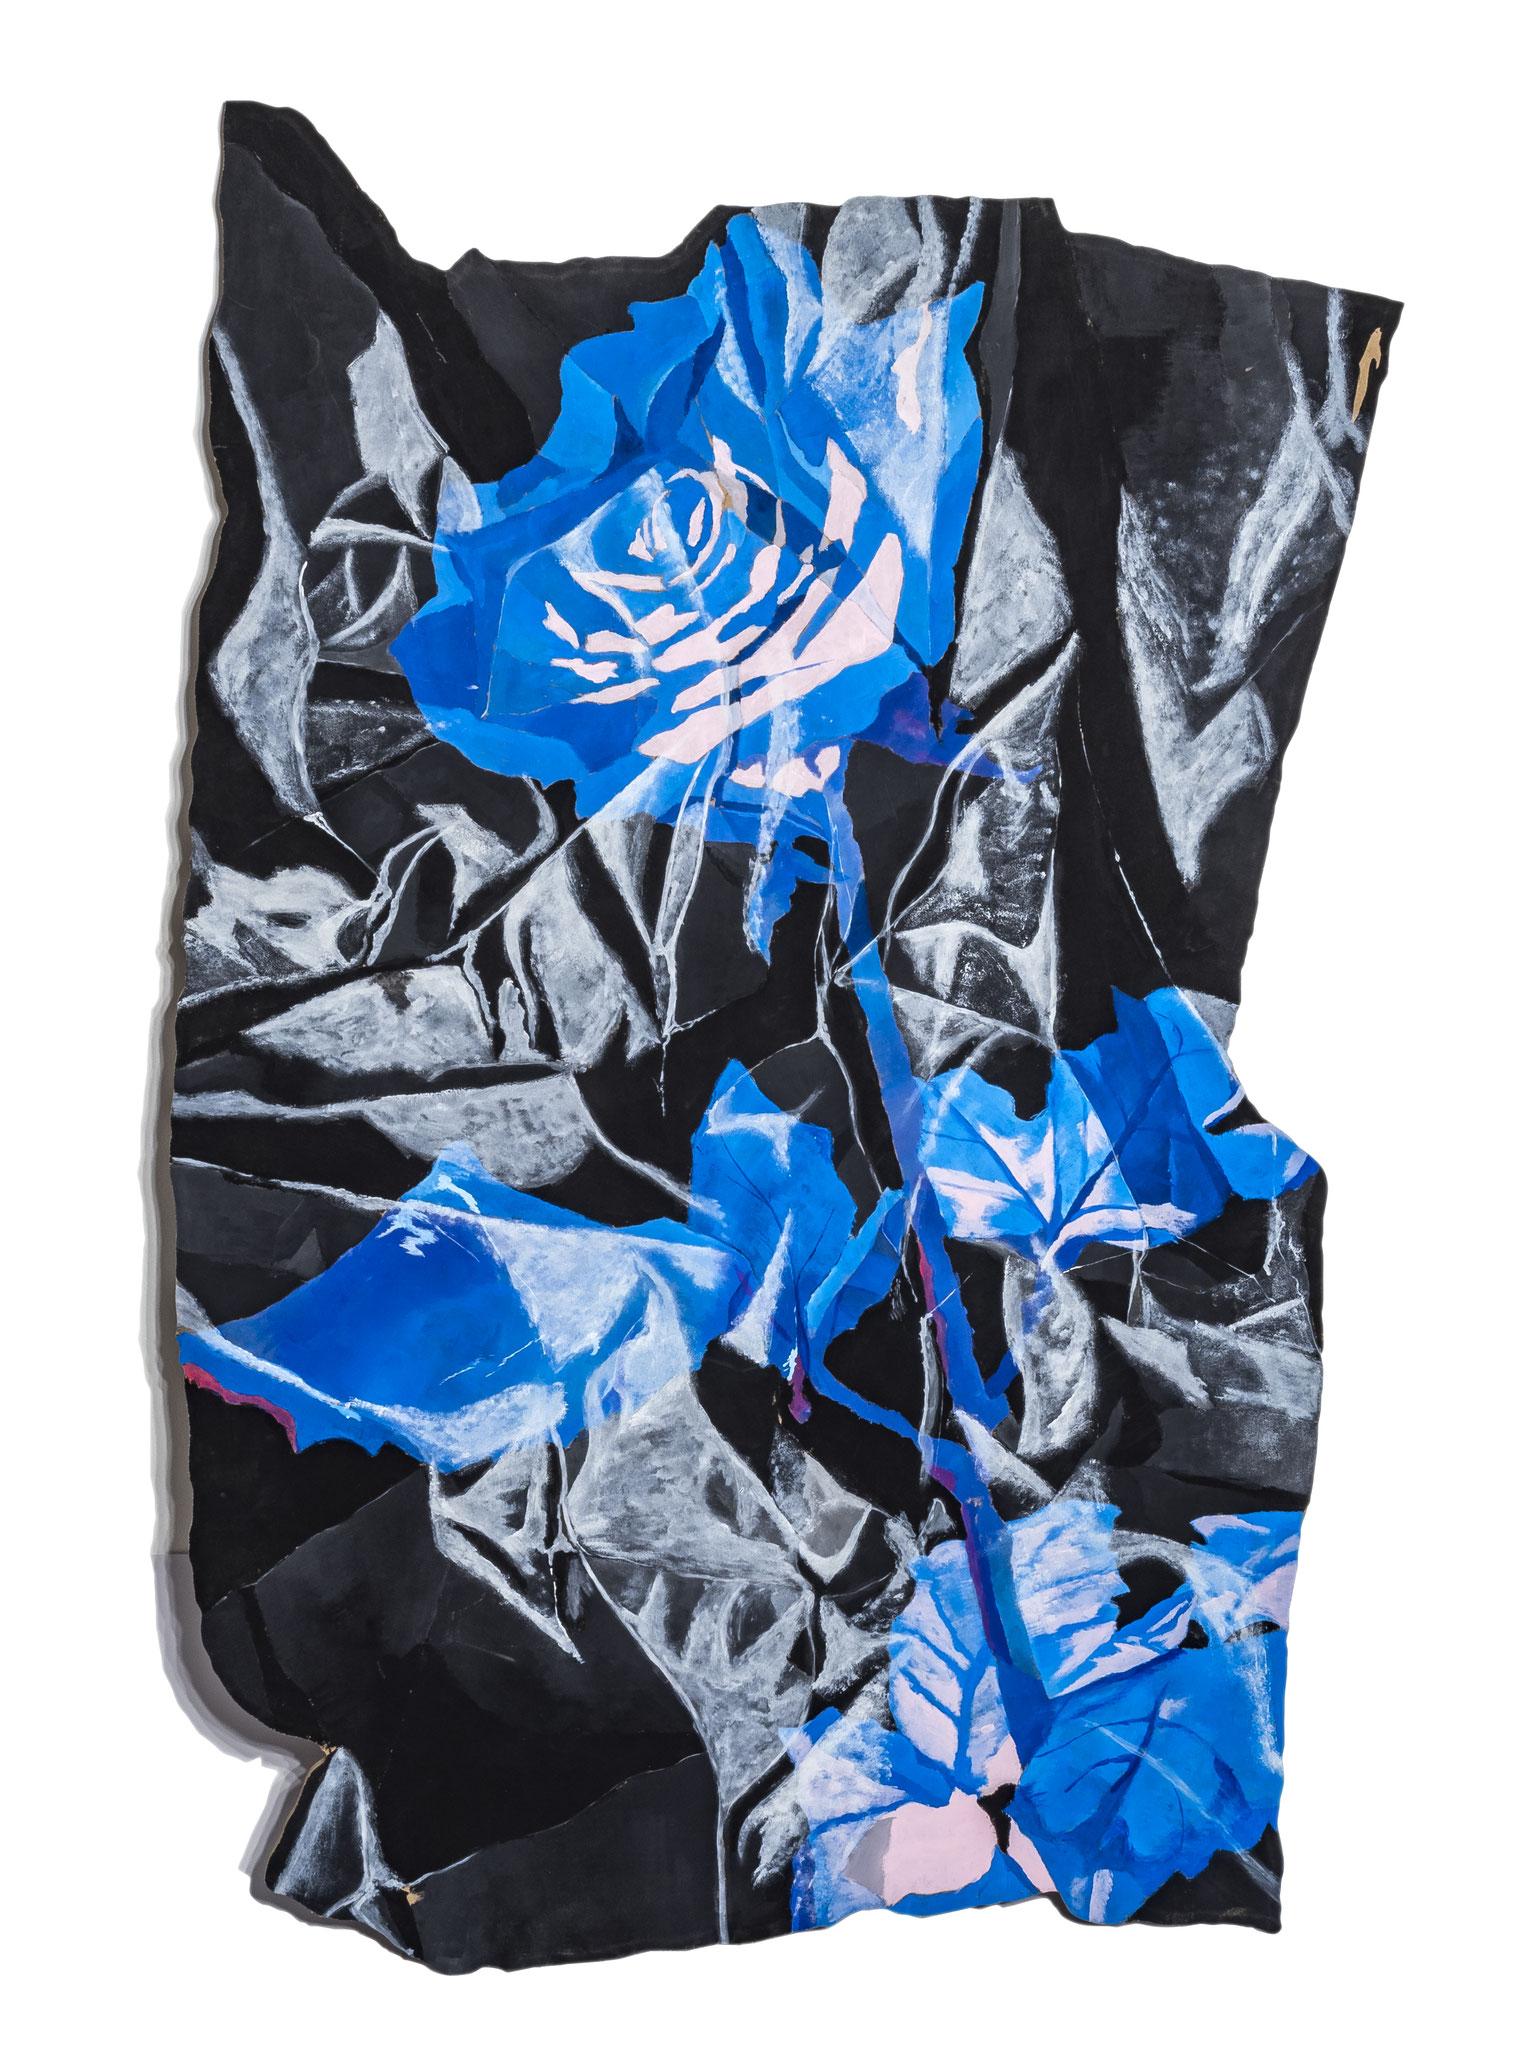 Negative Rose - 2019 - 150cm x 100cm